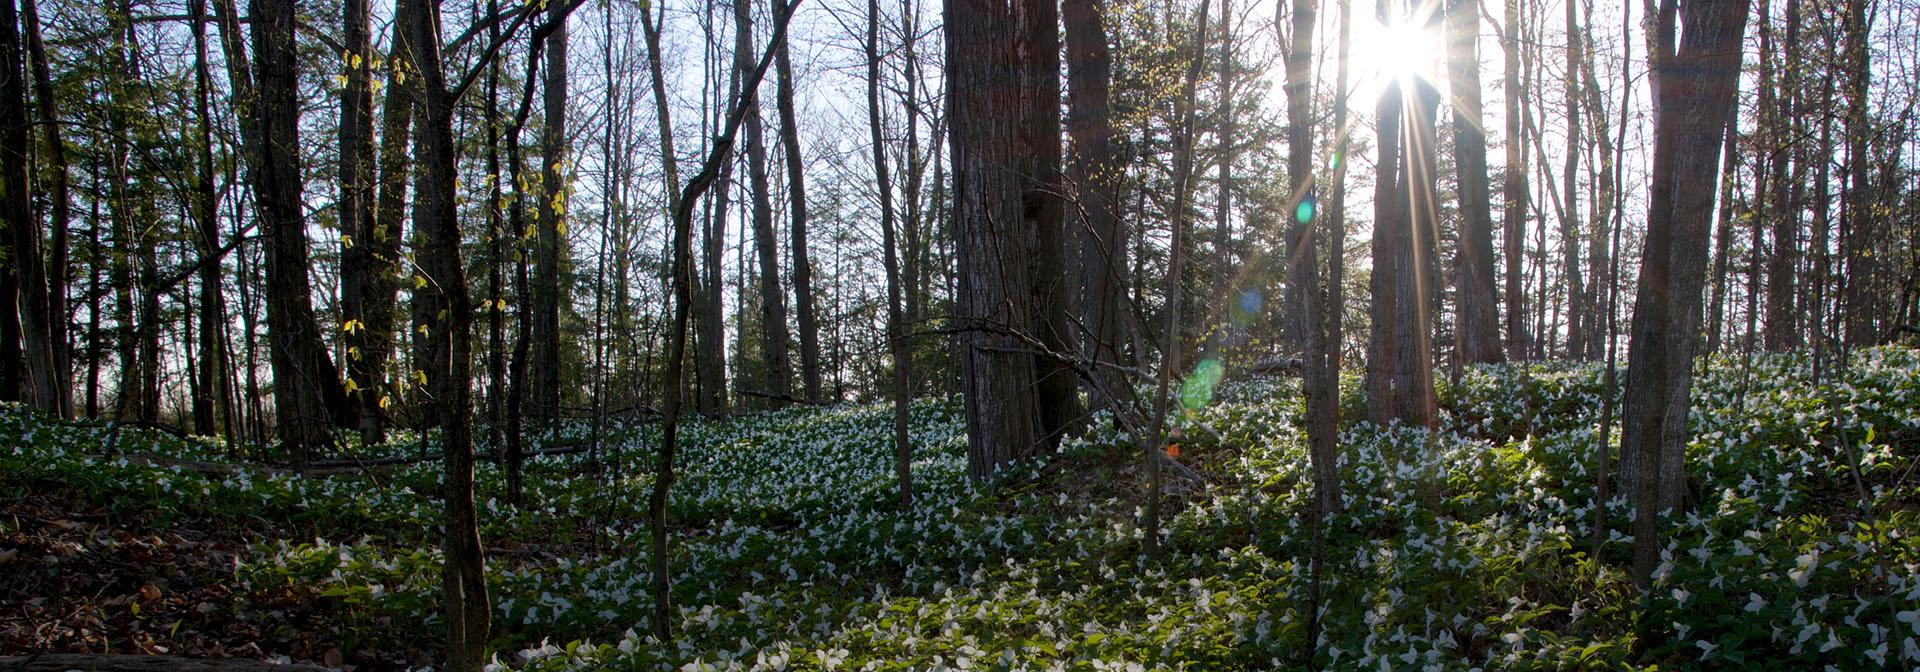 Ontario woodlot